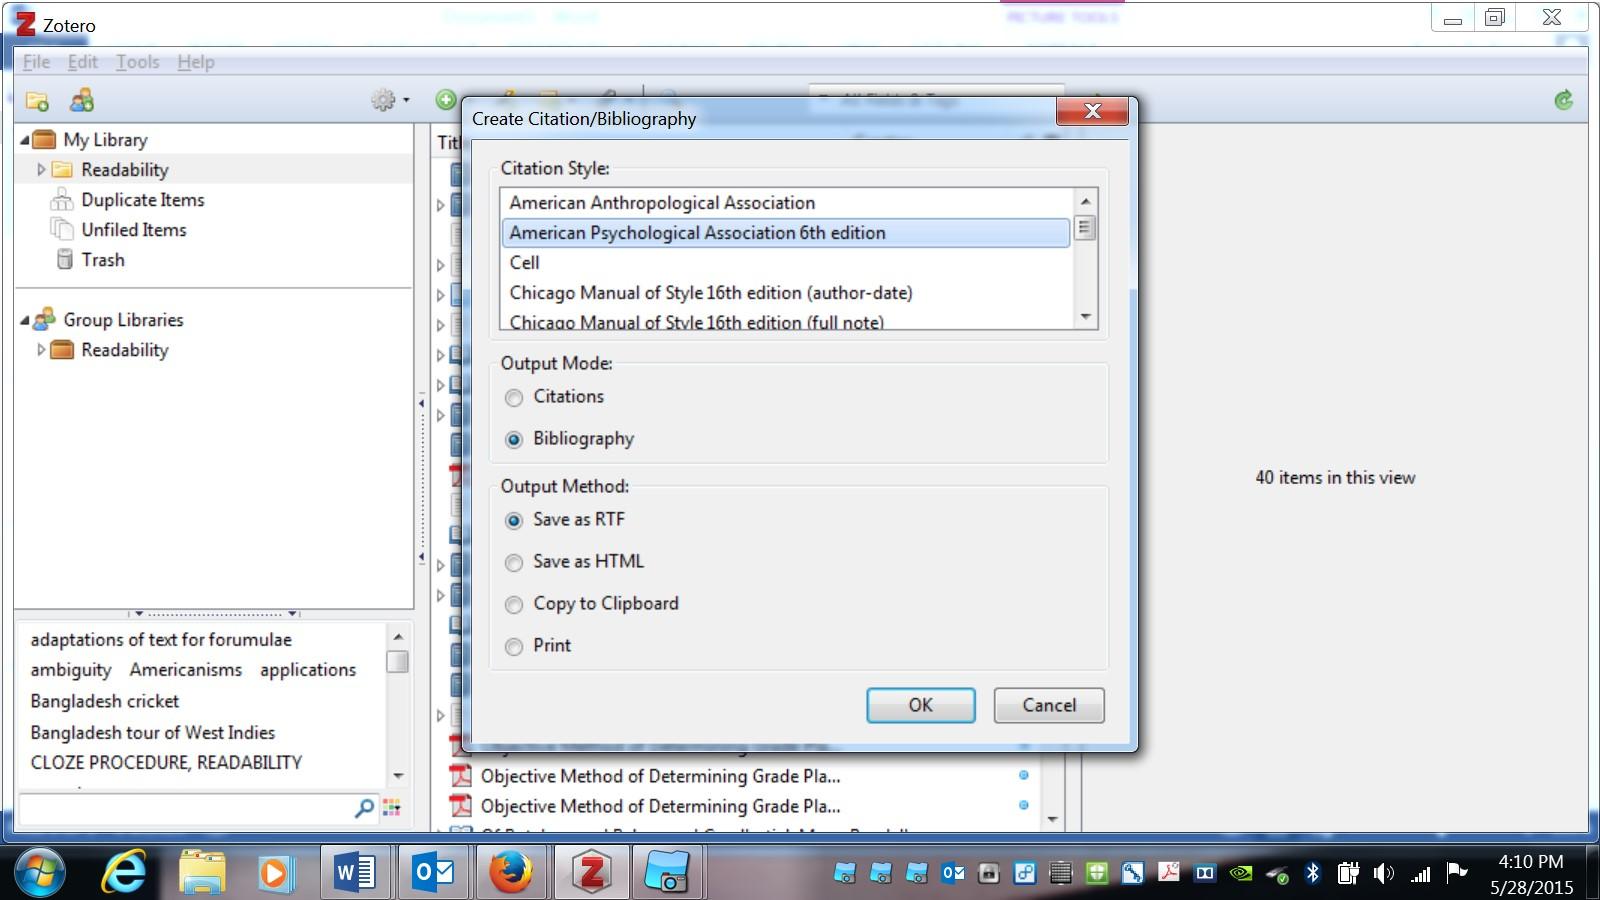 Bibliography options